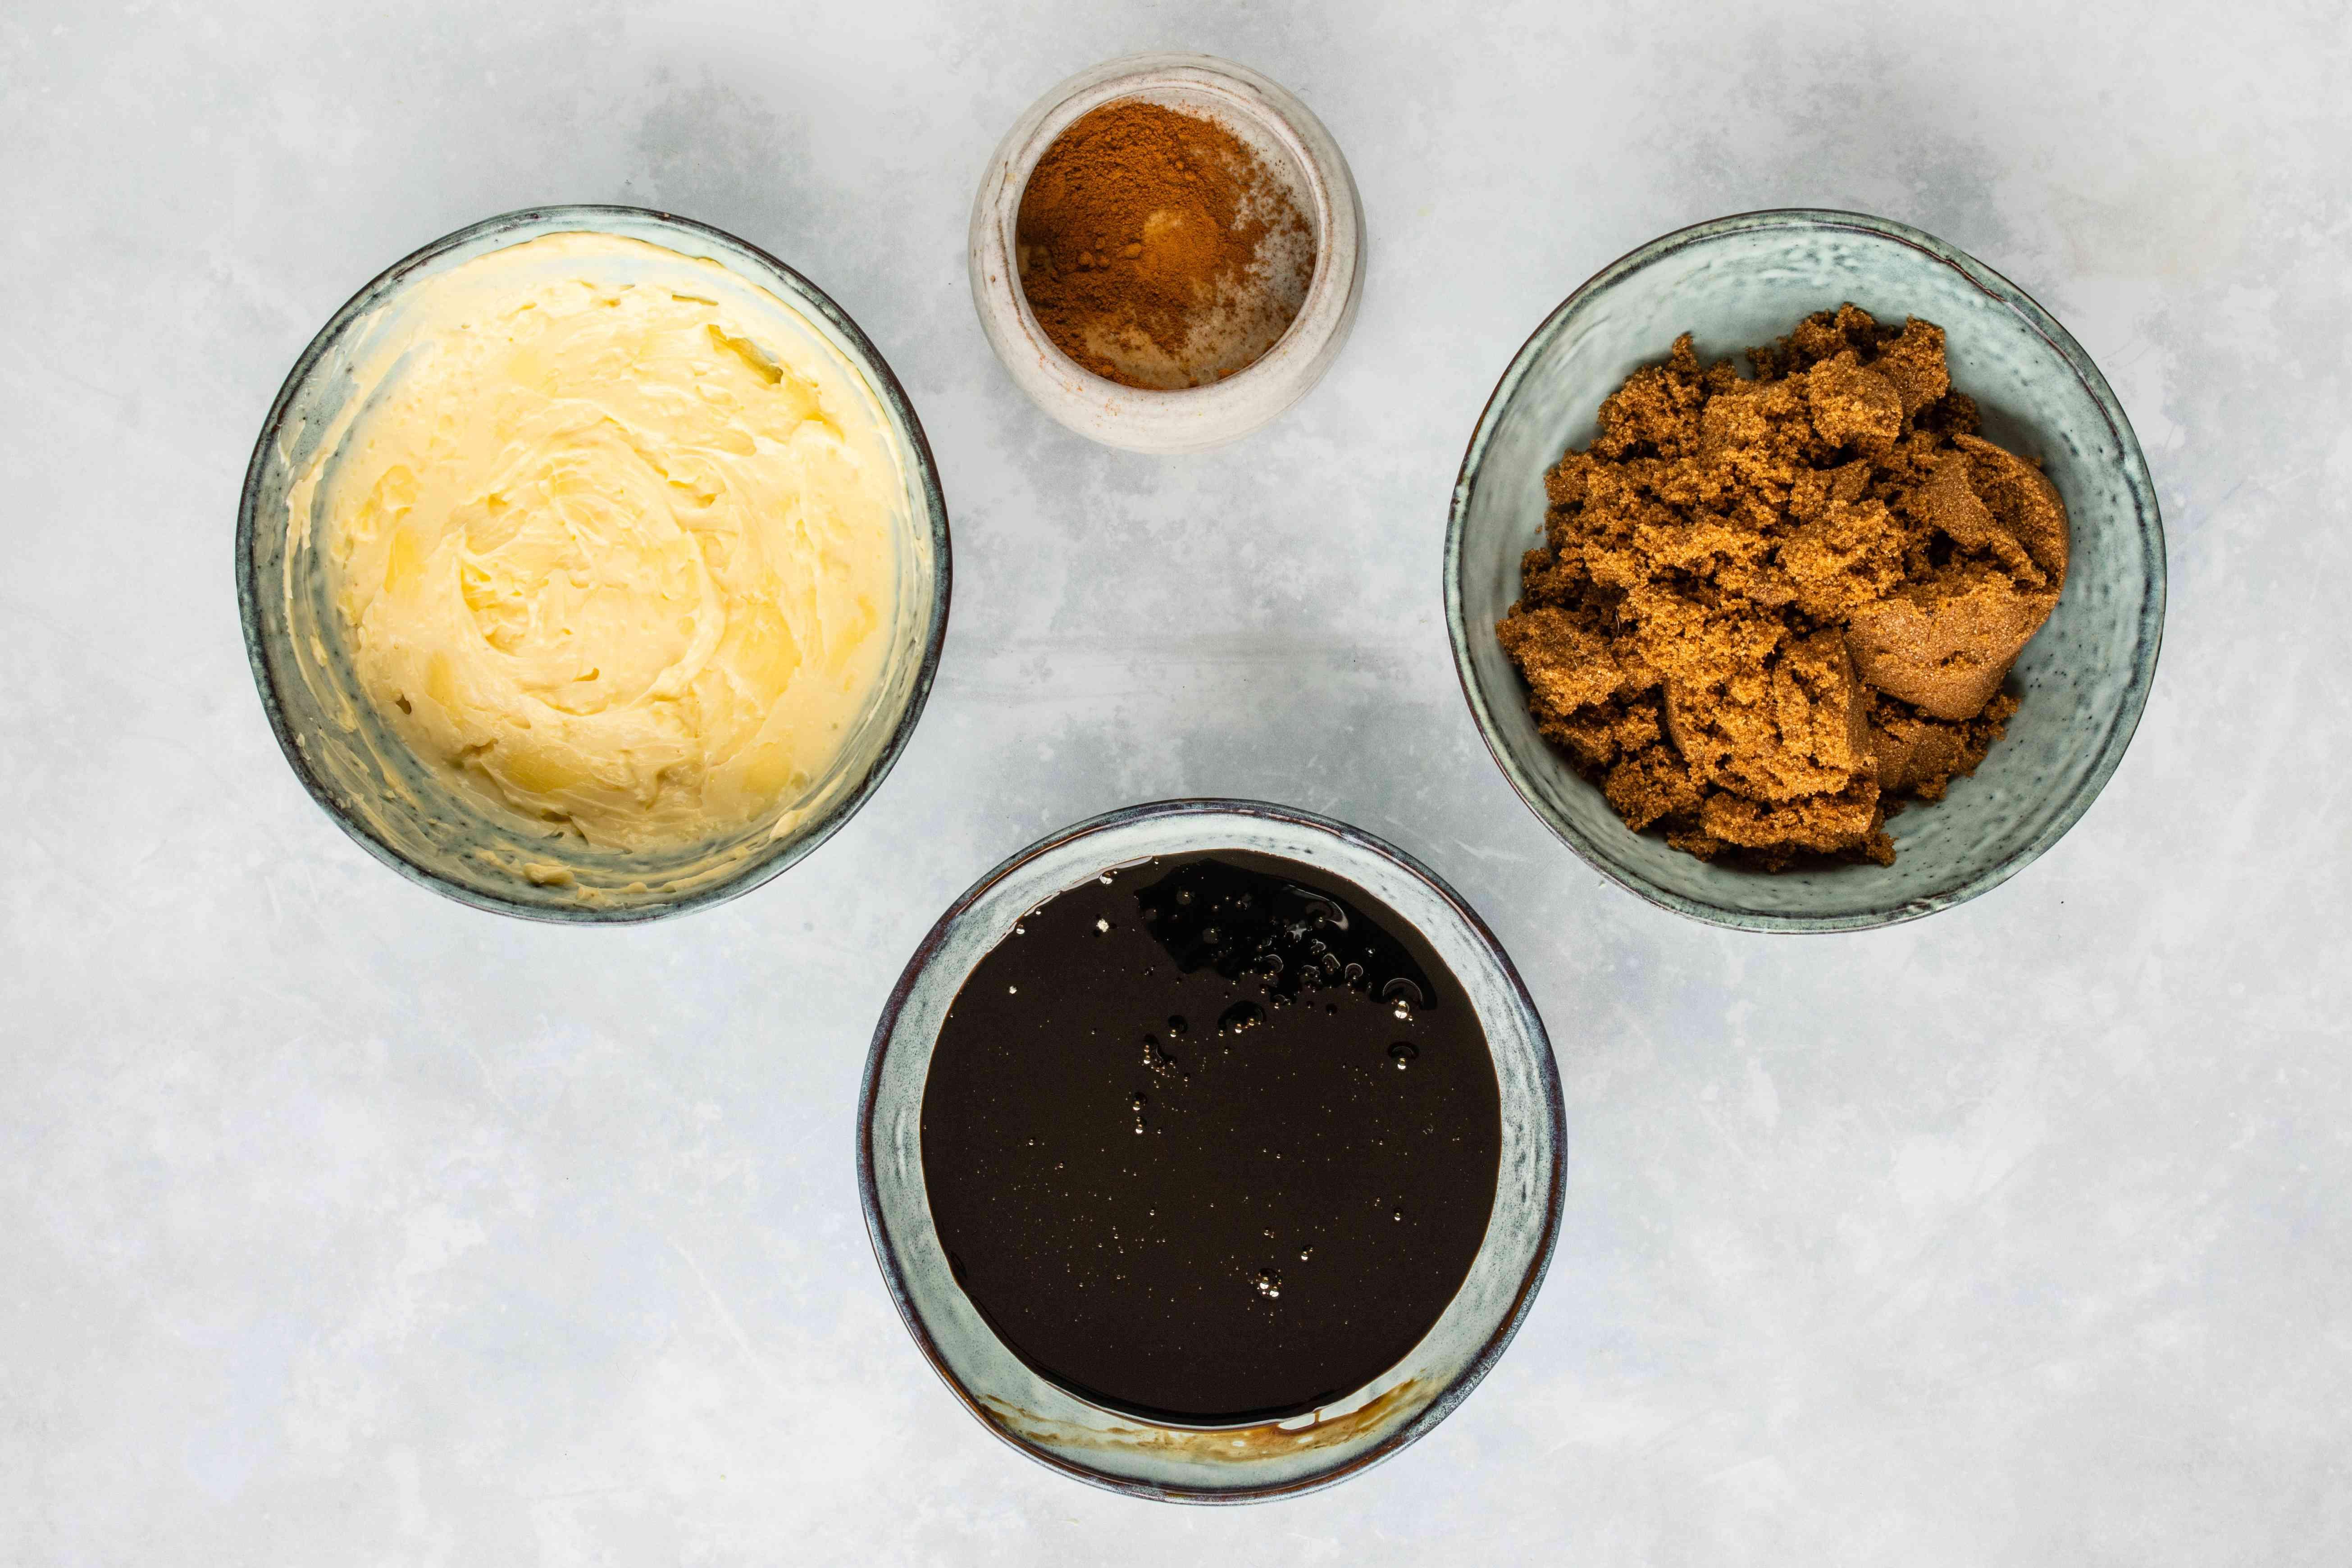 Ingredients for stroopfwafel filling